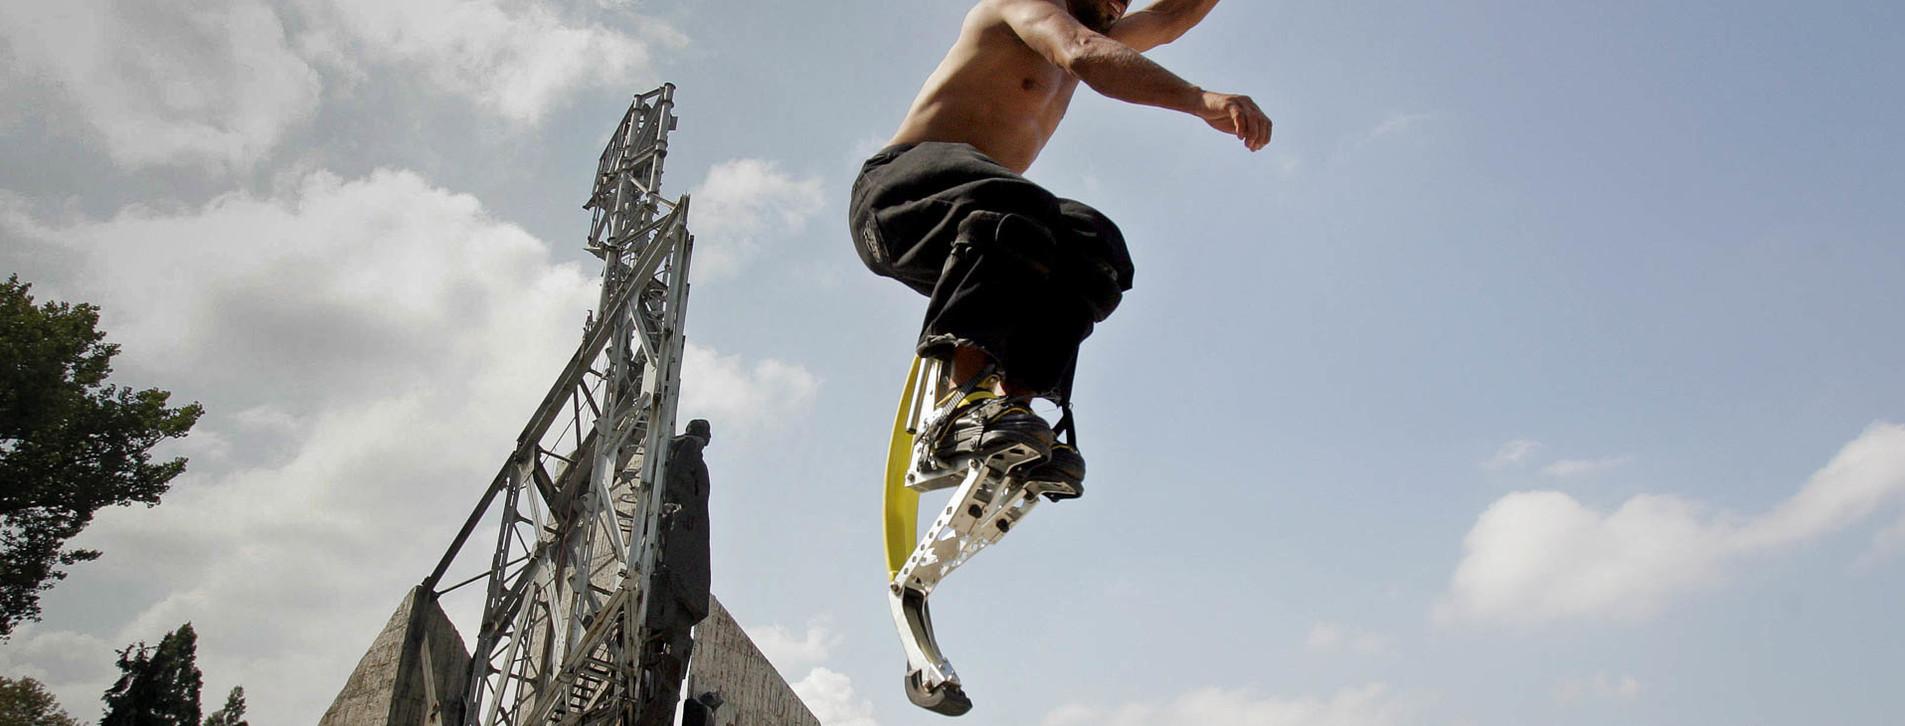 Фото - Прыжки на джамперах